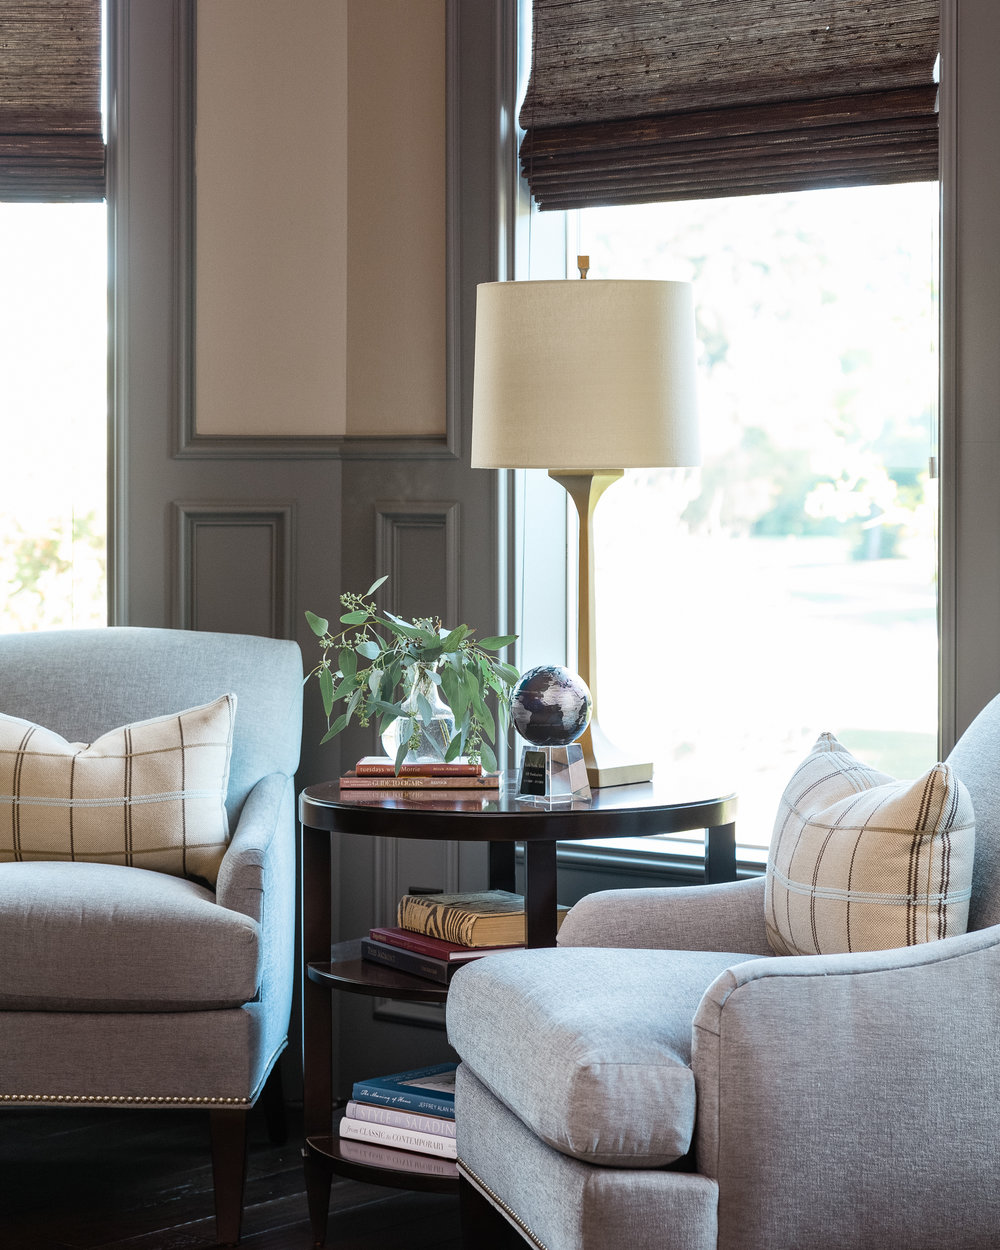 Home Office Seating | Carla Aston - Designer,  Colleen Scott - Photographer #study #homeoffice #paneling #homedecorideas #decorating